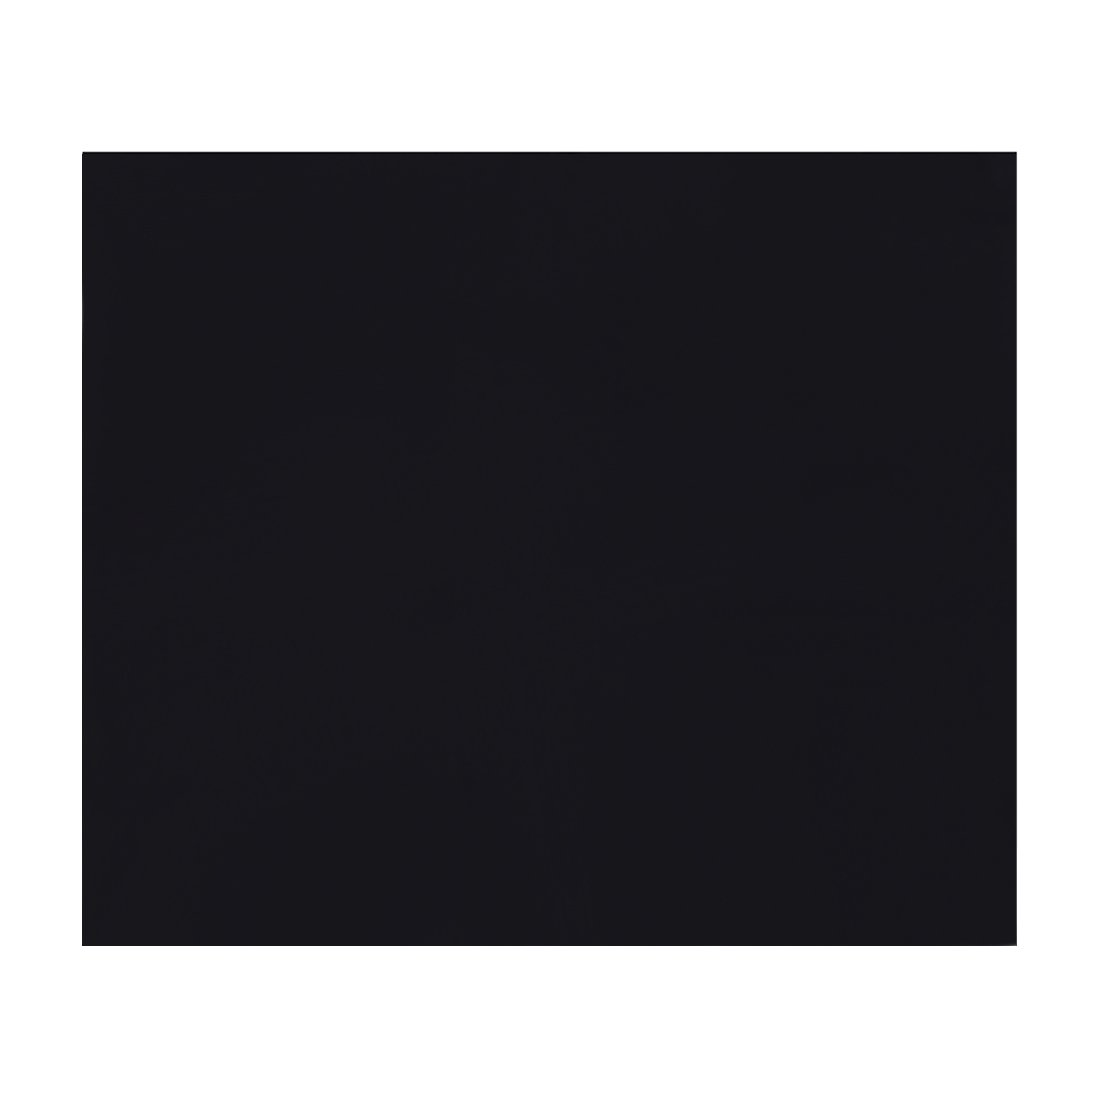 Walter Knoll Mason Tijdschriftenhouder Zwart Chroom Black